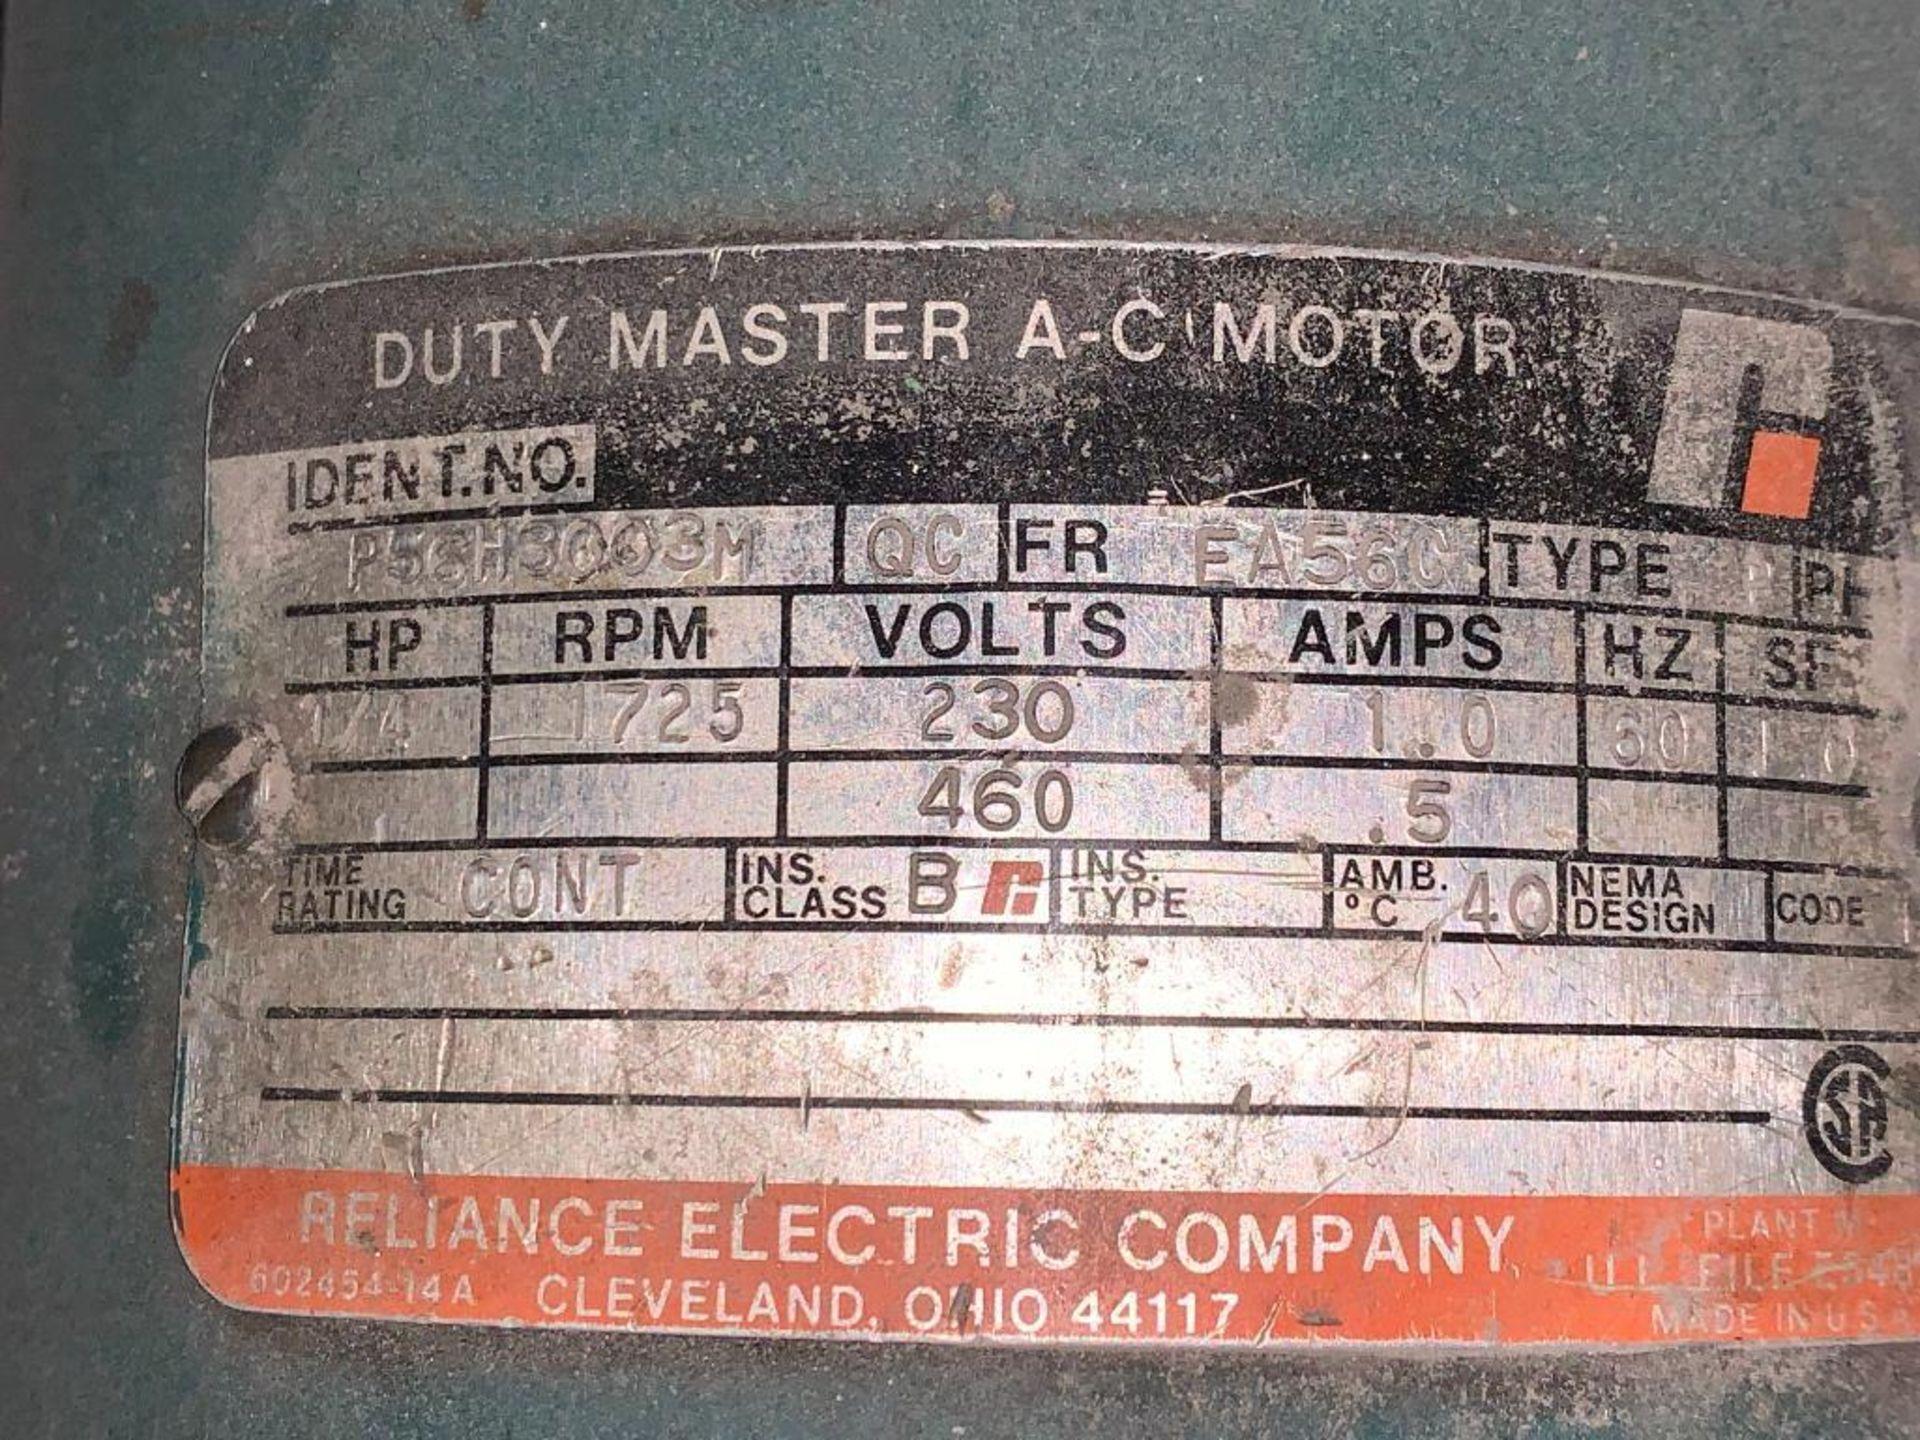 1978 Clybourn carton erecting filling closing machine - Image 52 of 68